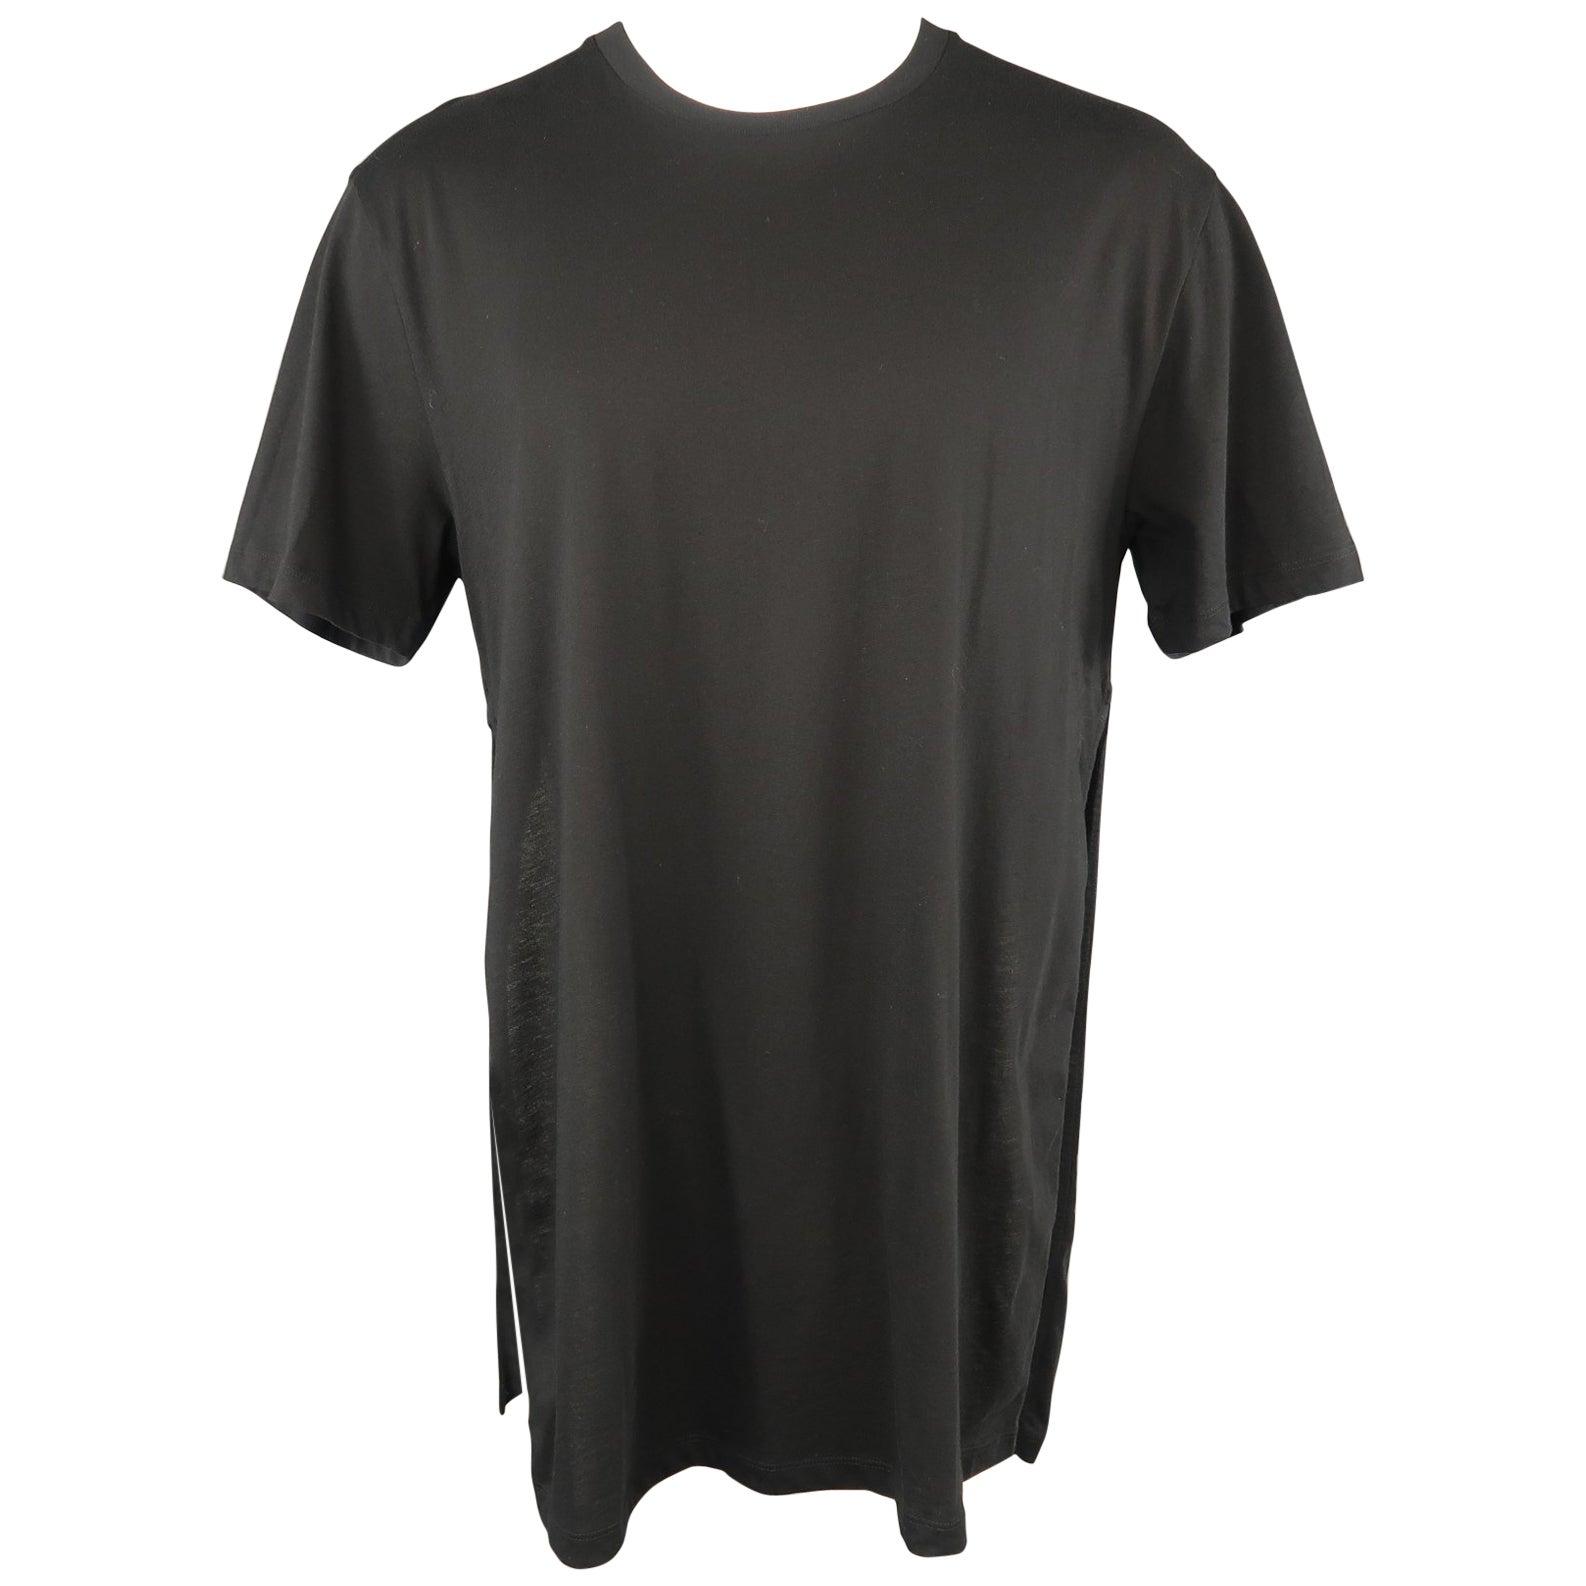 GAULTIER2 by JEAN PAUL GAULTIER Size XS Black Cotton Crew-Neck Slit Side T-shirt